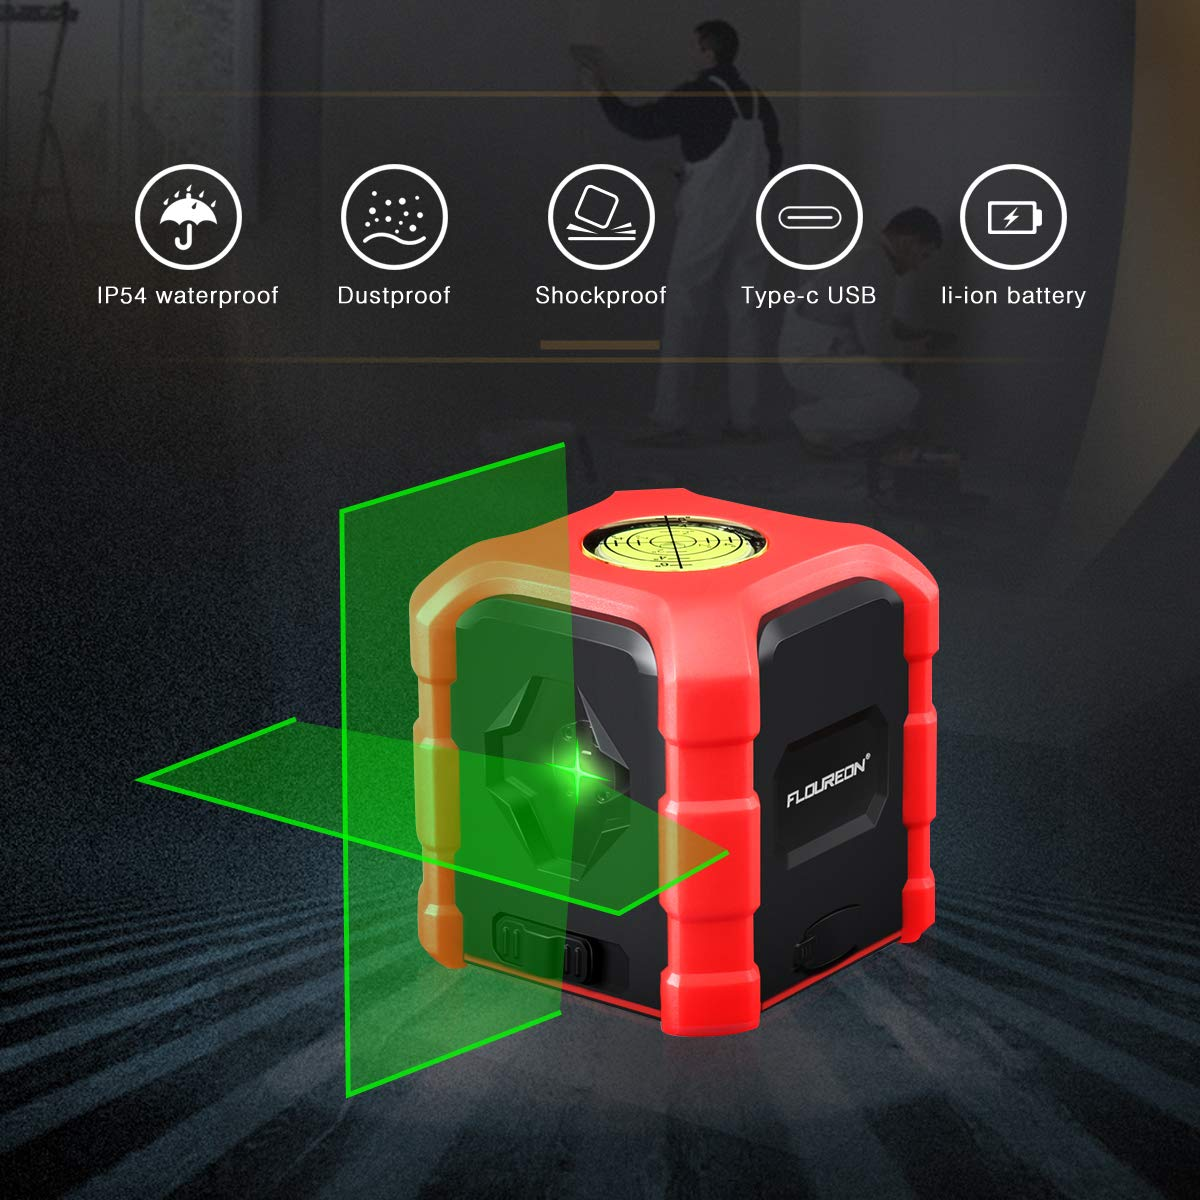 Soporte Giratorio Magn/ético USB Carga 2 AA pilas icluidas FLOUREON Nivel L/áser Autonivelante Verde 30M L/íneas Cruzadas 130/° Horizontal y Vertical 360 grados IP54